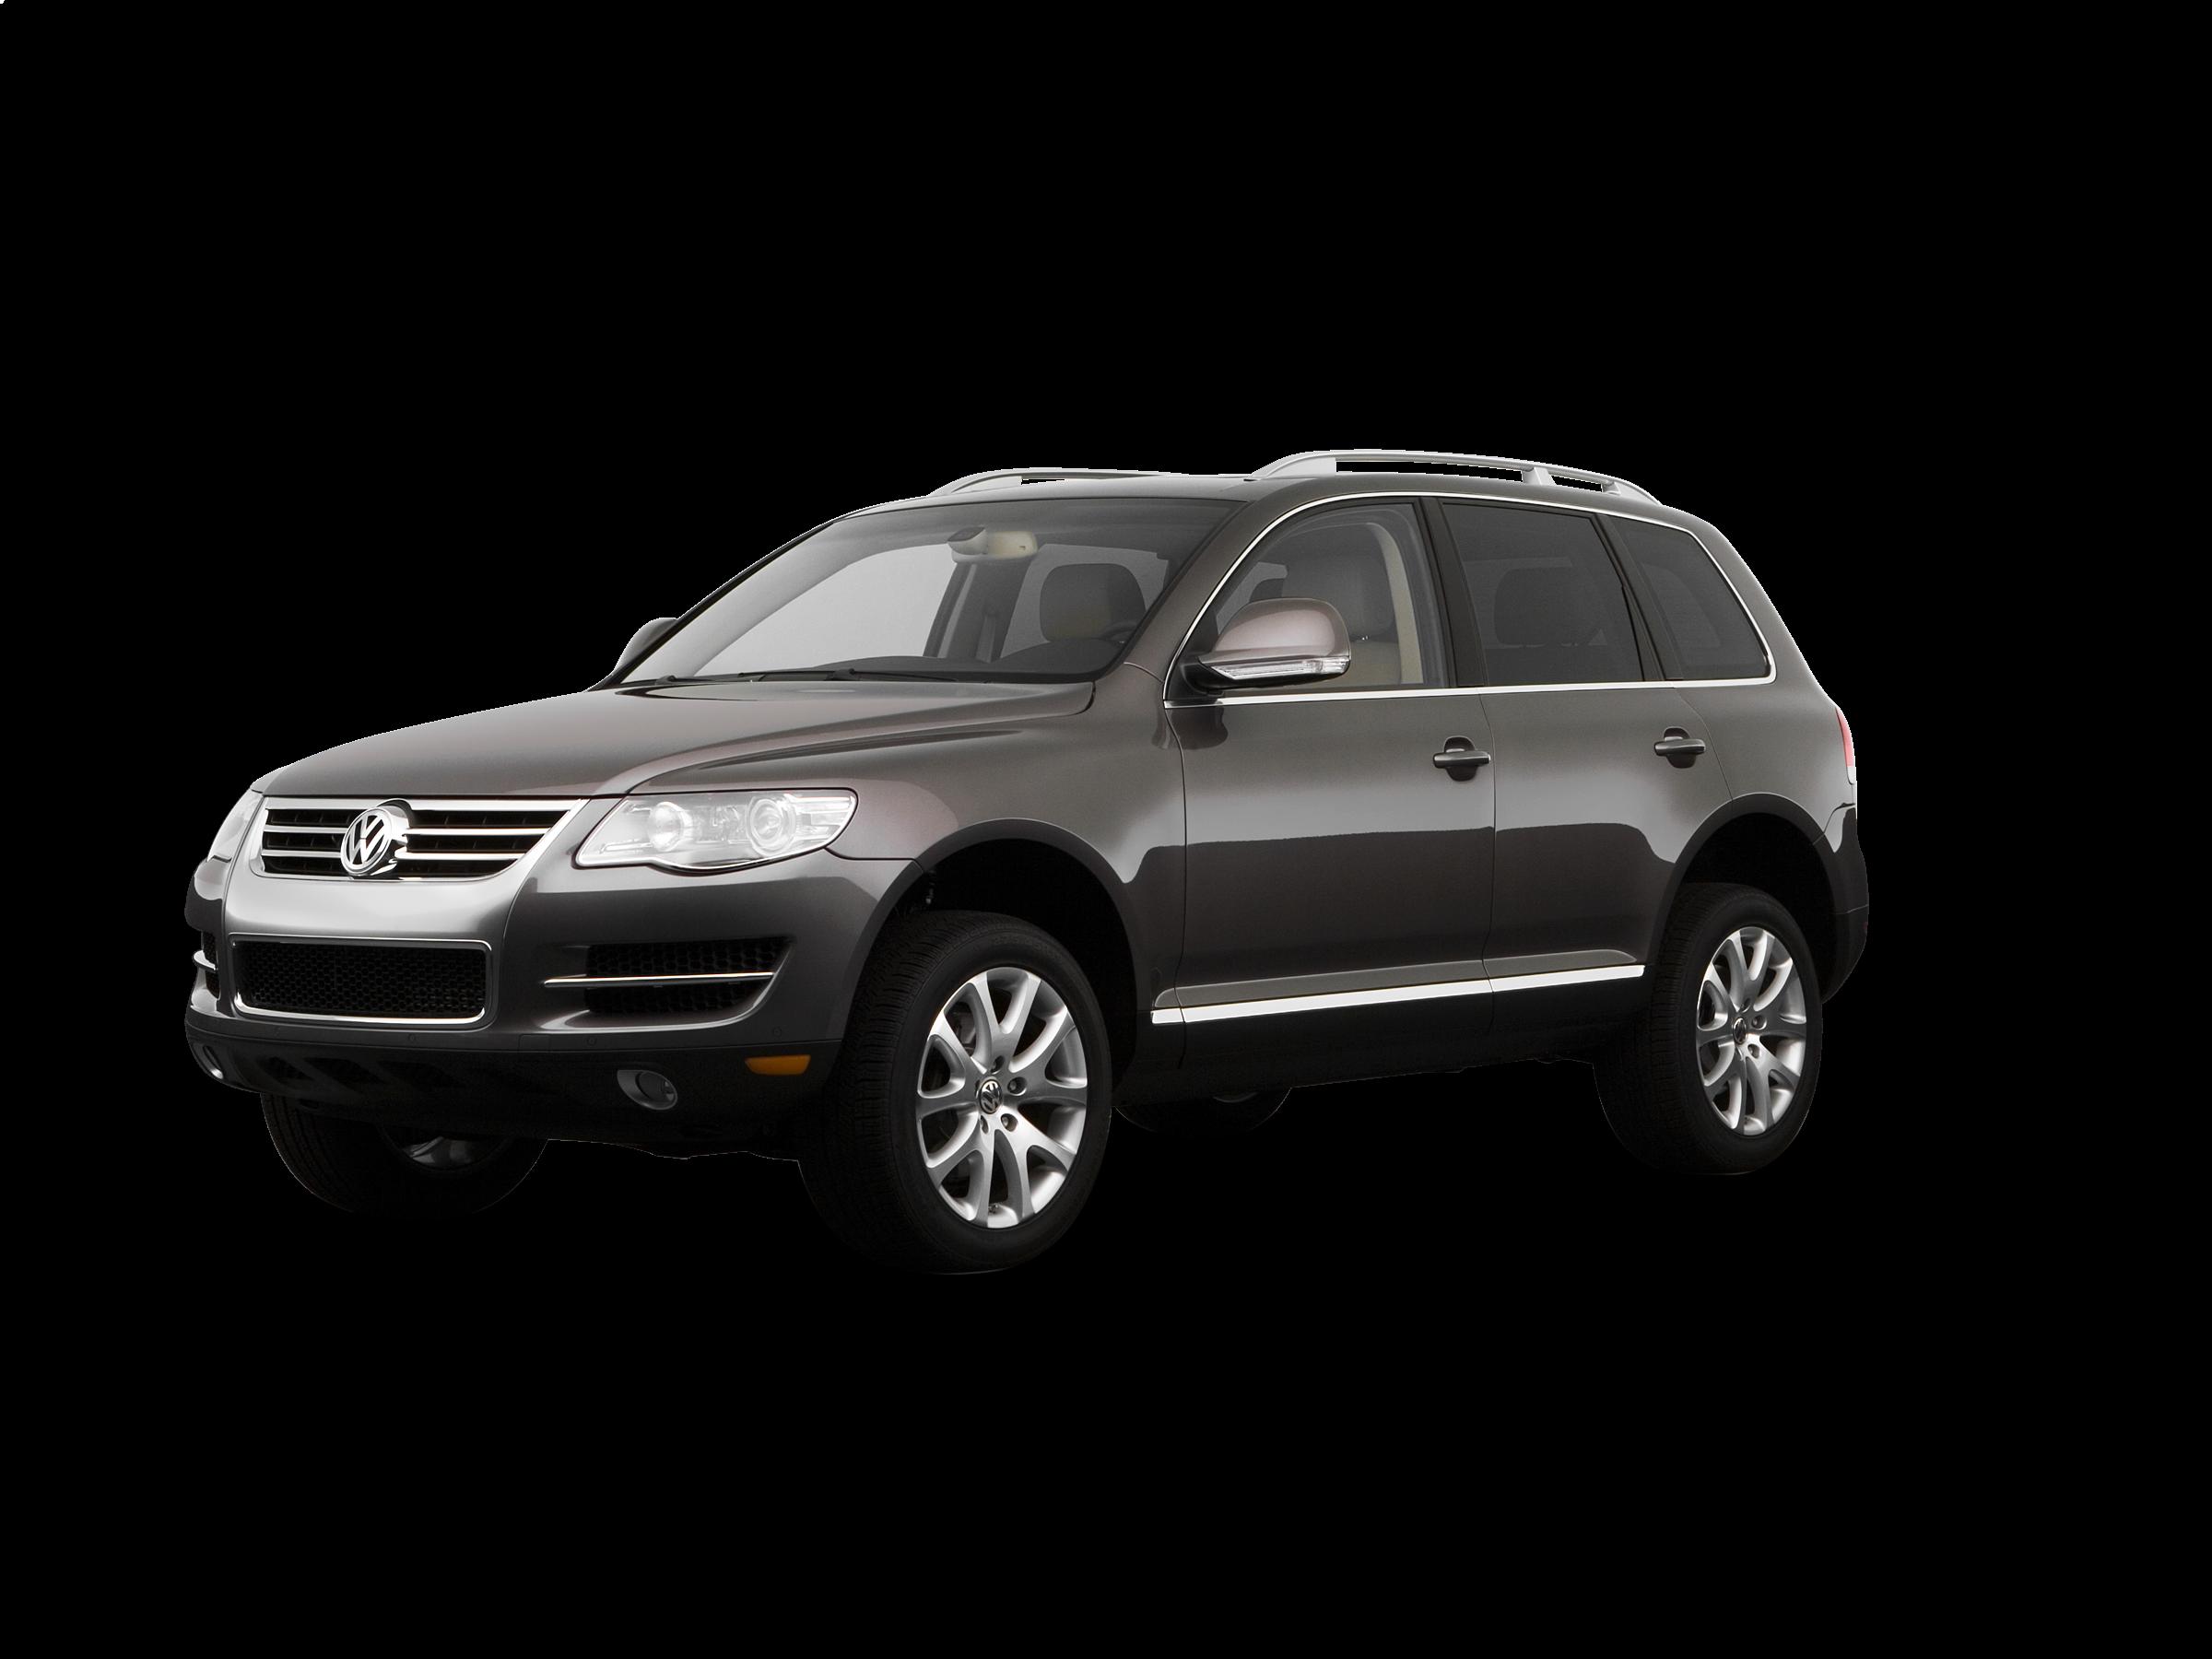 2008 Volkswagen Touareg 2 Values Cars For Sale Kelley Blue Book